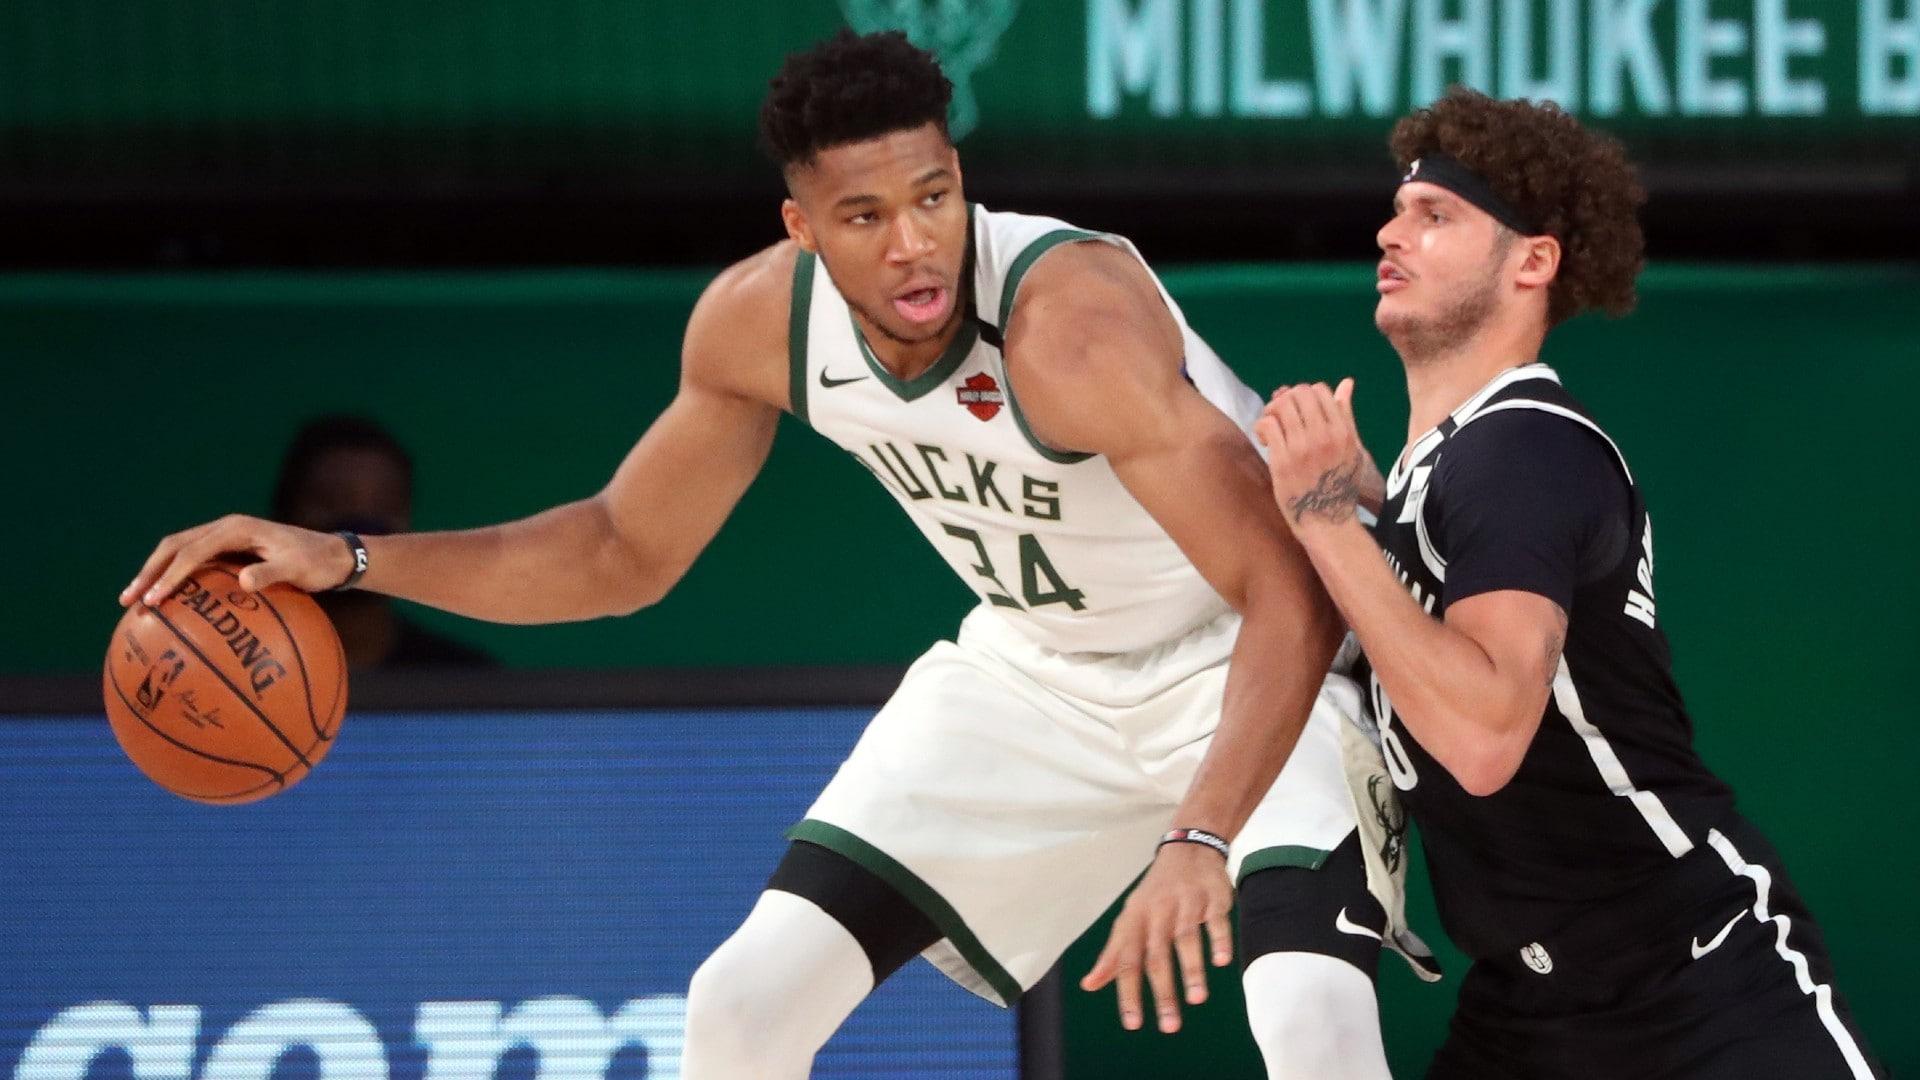 BKN vs MIL Aug 4, 2020 | NBA.com